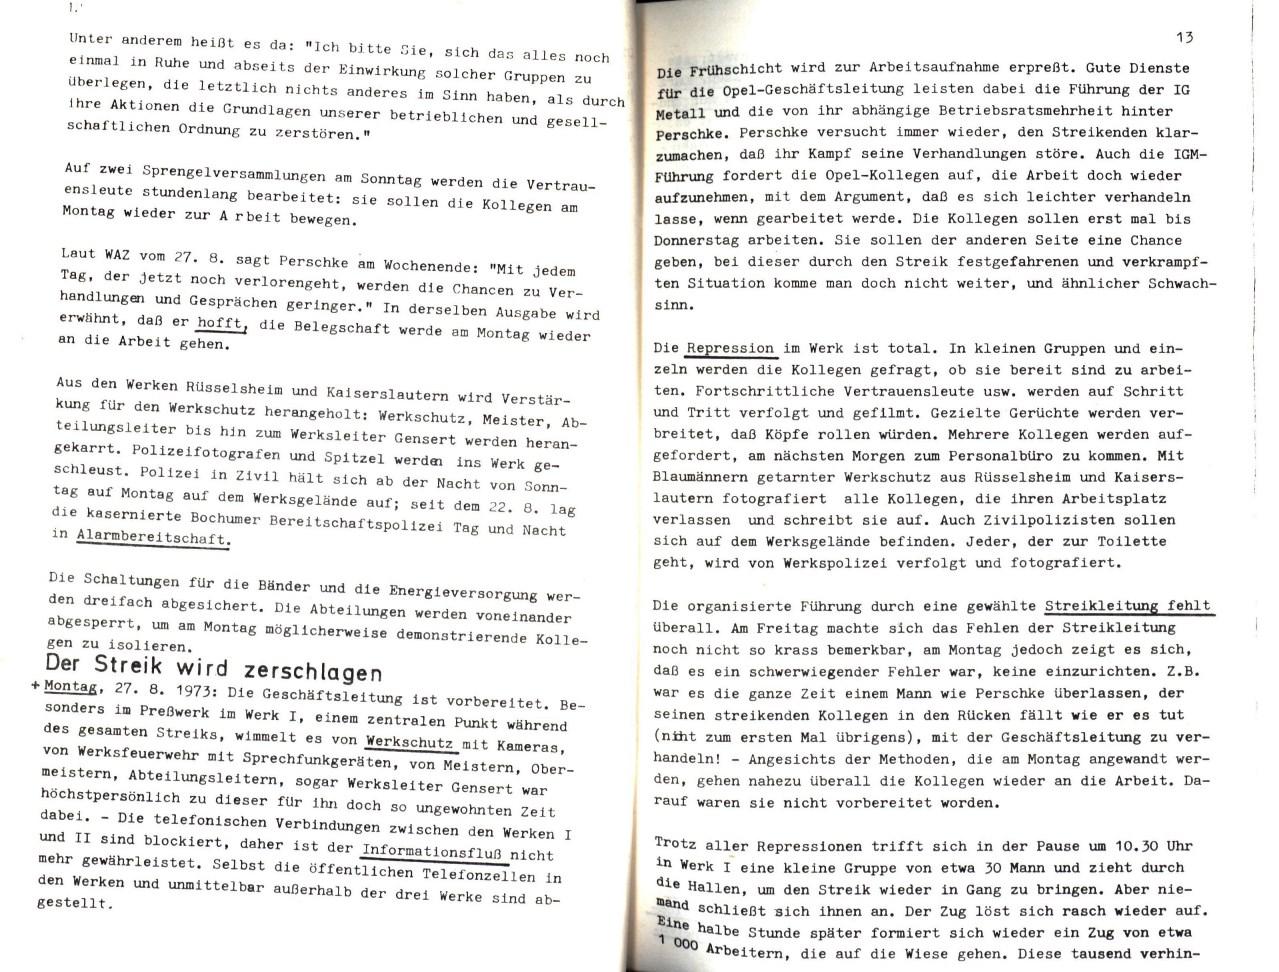 Bochum_IGM_Opel_PG_Opel_streikt_1973_008